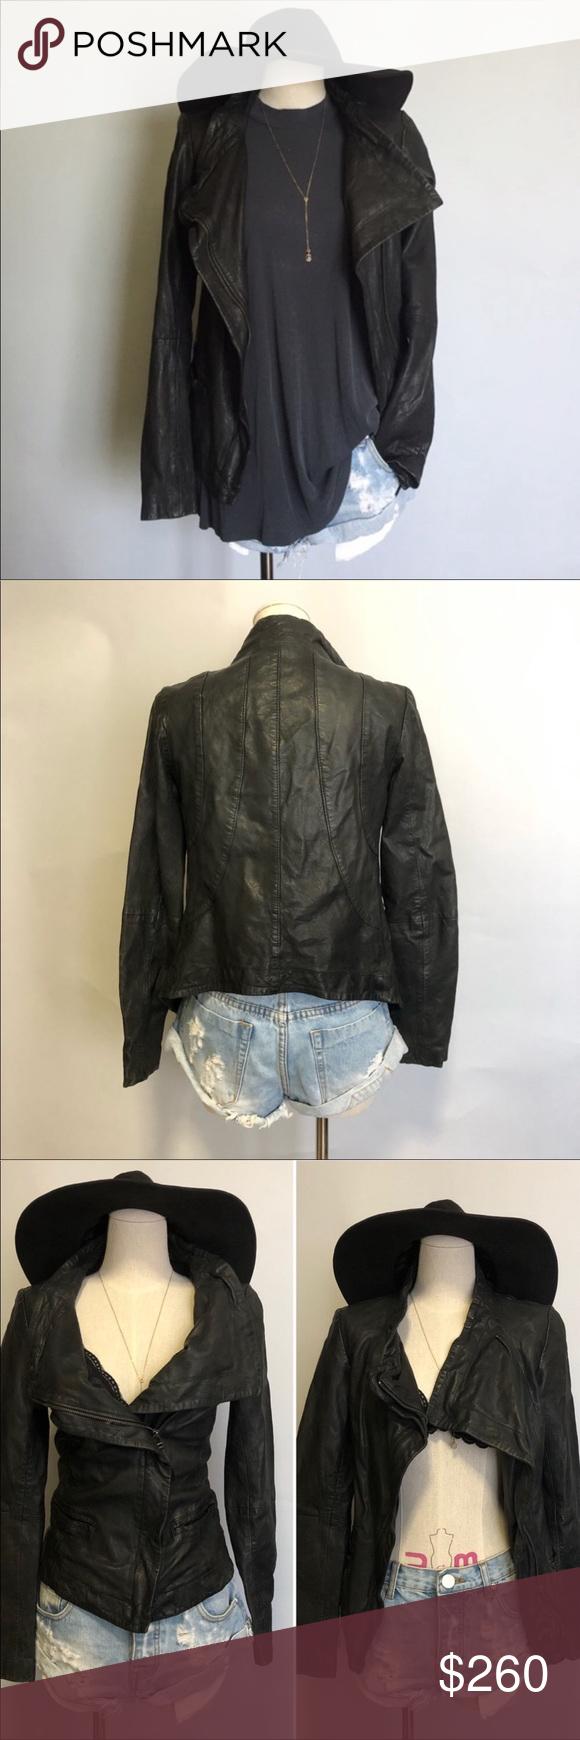 All Saints black leather jacket size is 6 Black leather